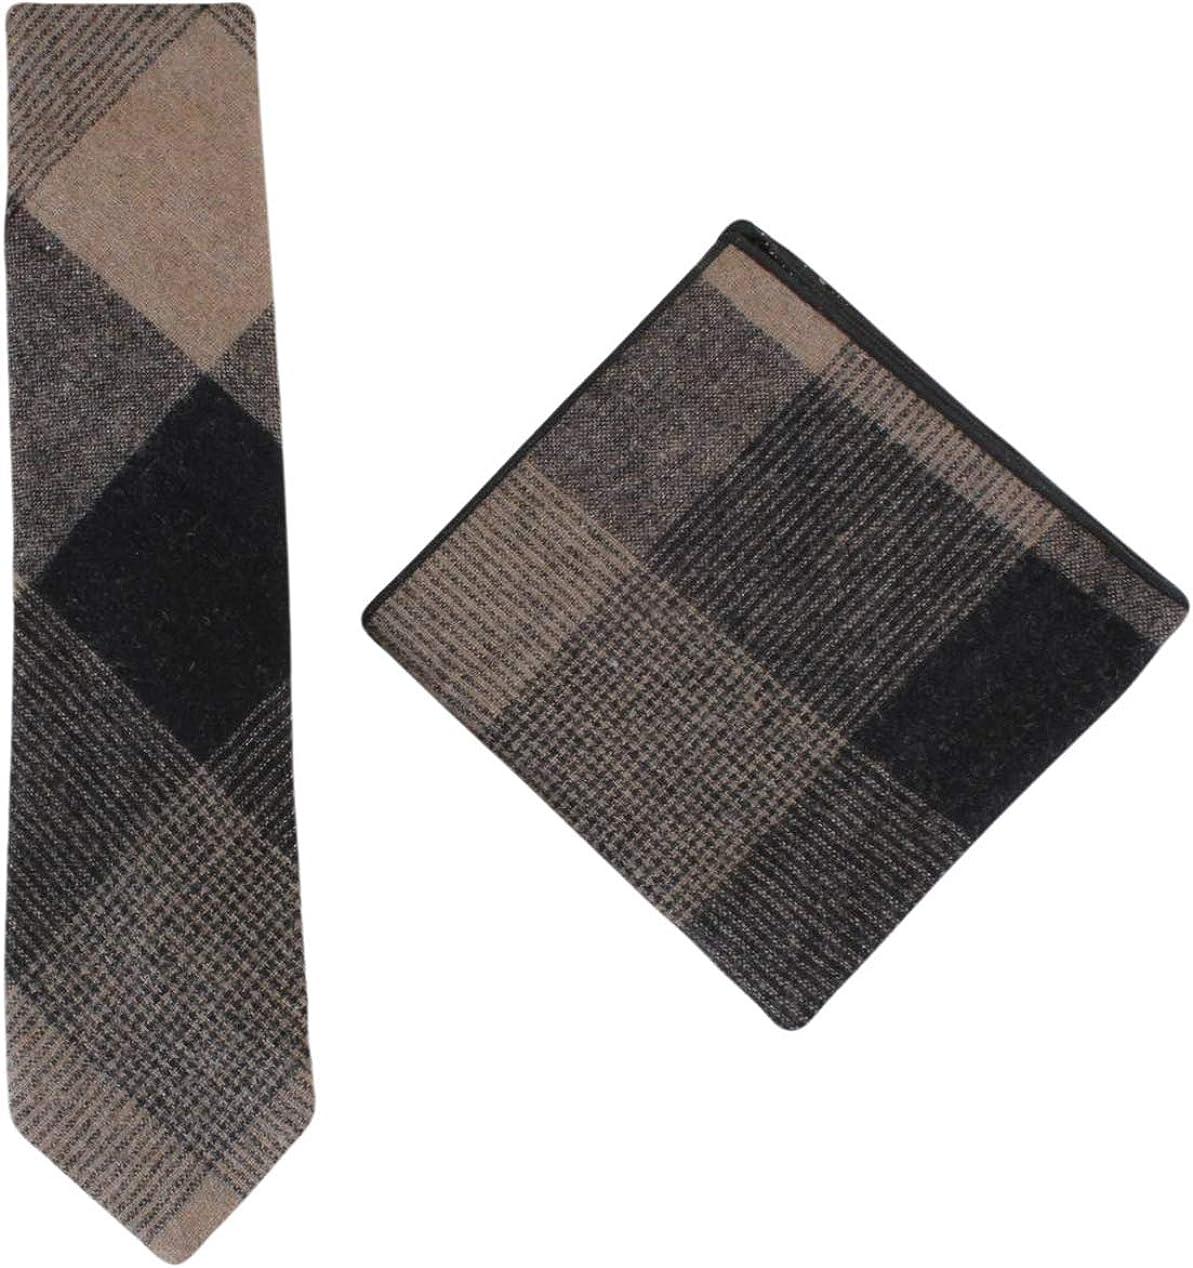 Knightsbridge Neckwear Mens Large Check Tie and Pocket Square Set - Beige/Brown